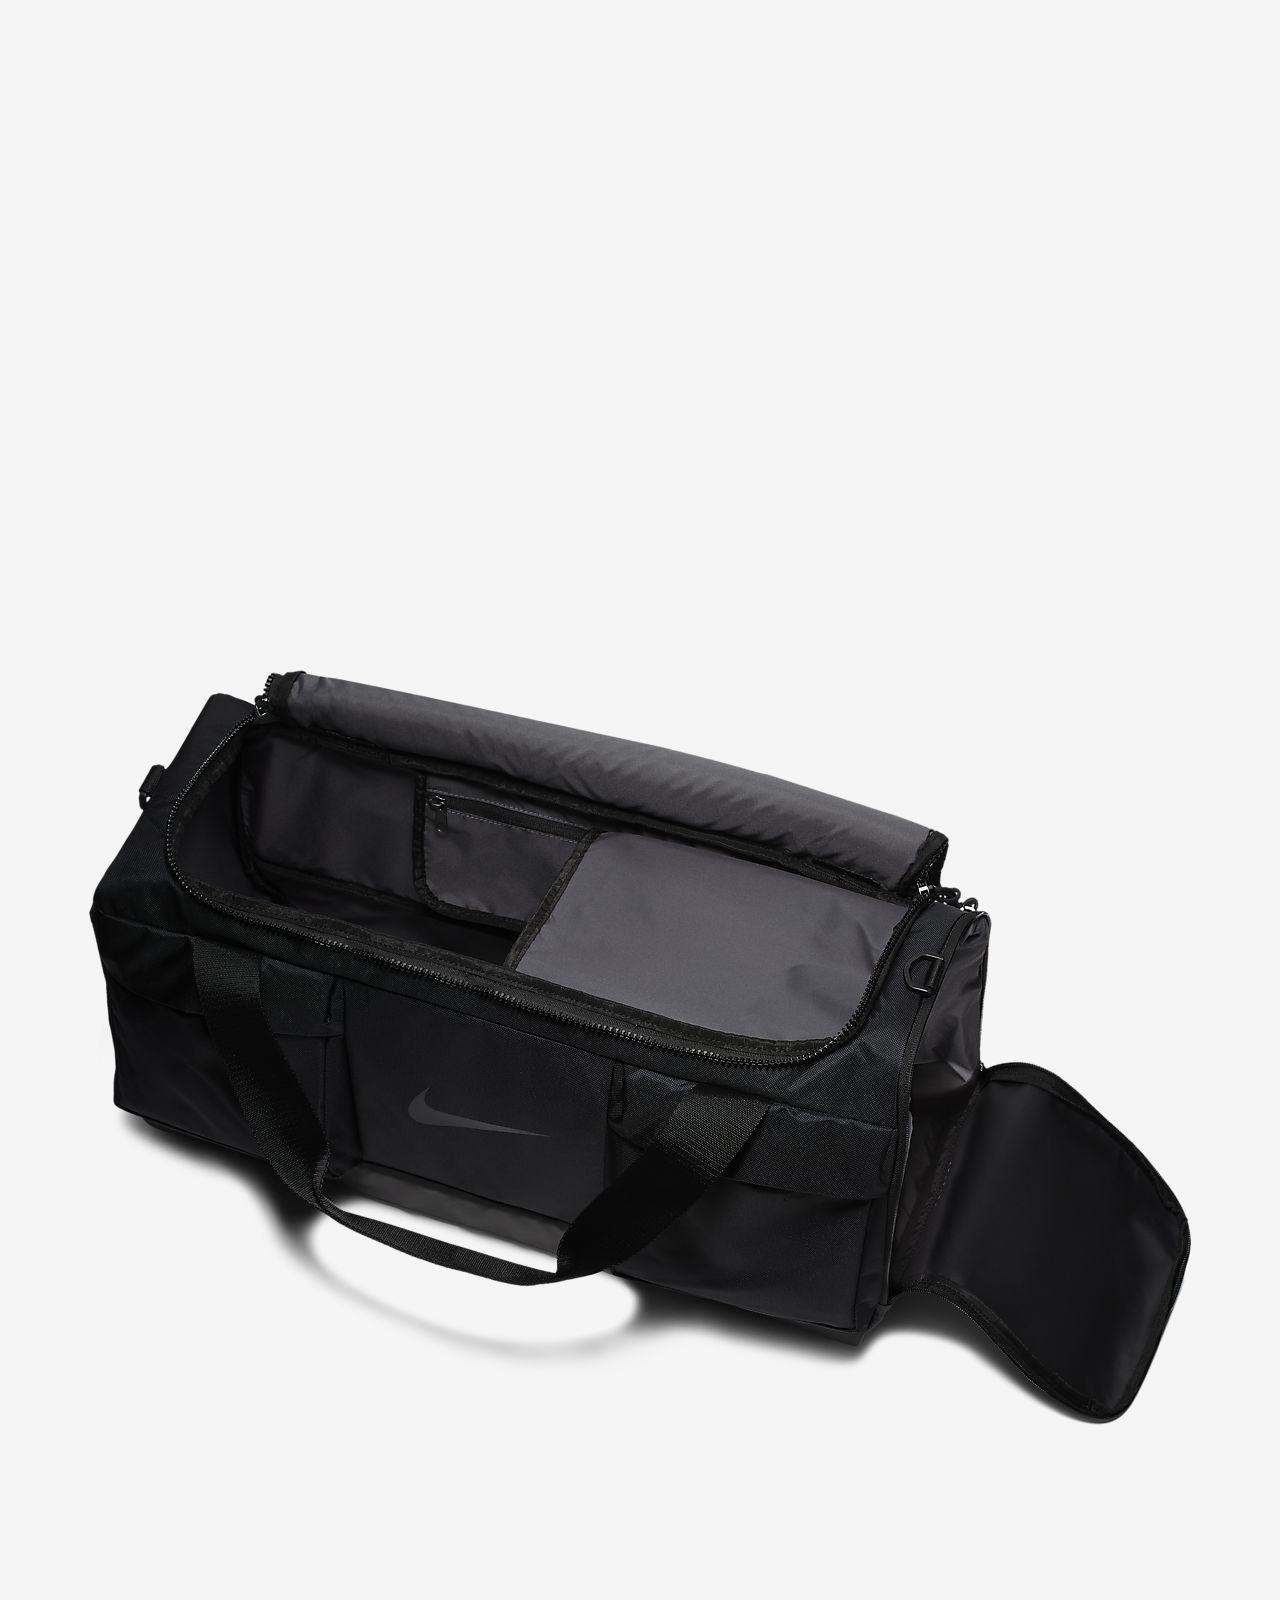 dc87673725 Nike Vapor Power Men's Training Duffel Bag (Medium). Nike.com CA